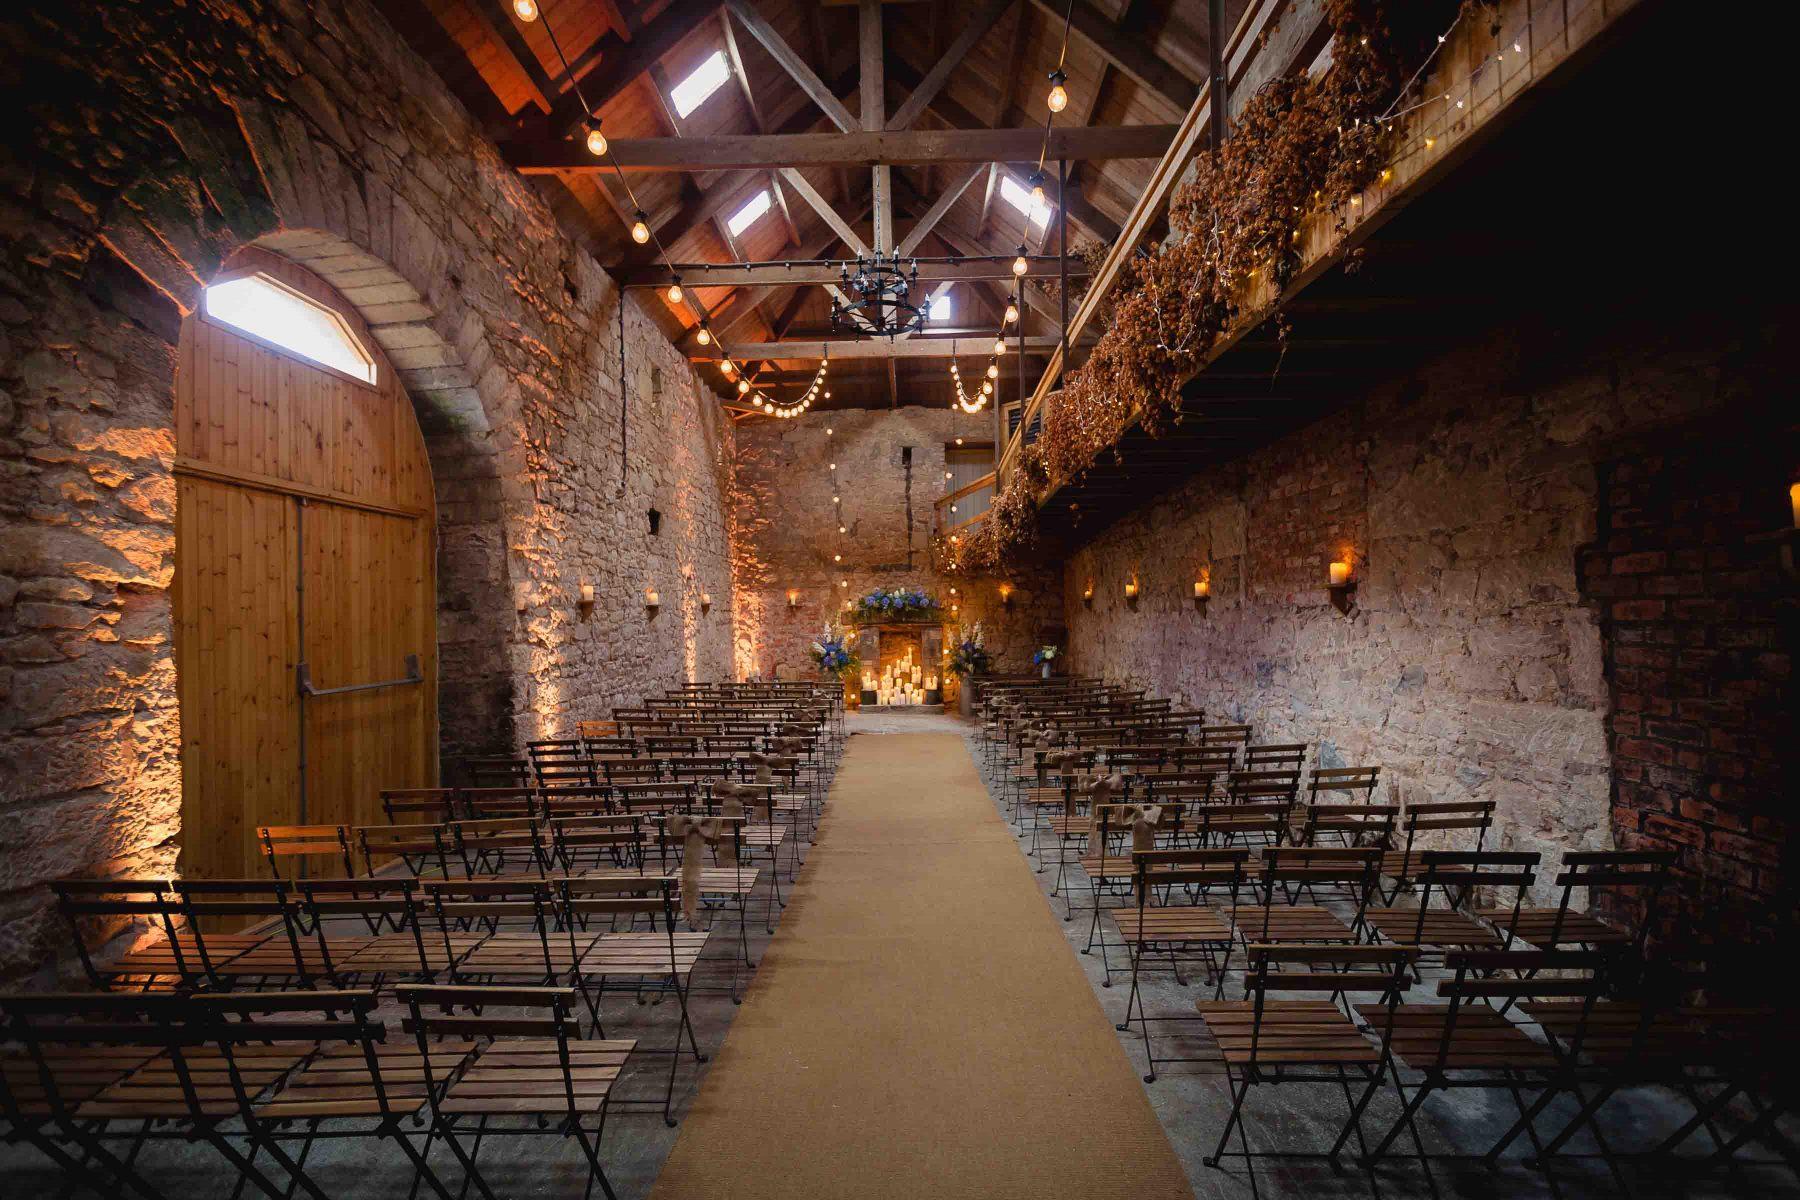 Doxford-Barns-The-Threshing-Hall-Dru-Dodd-Photography